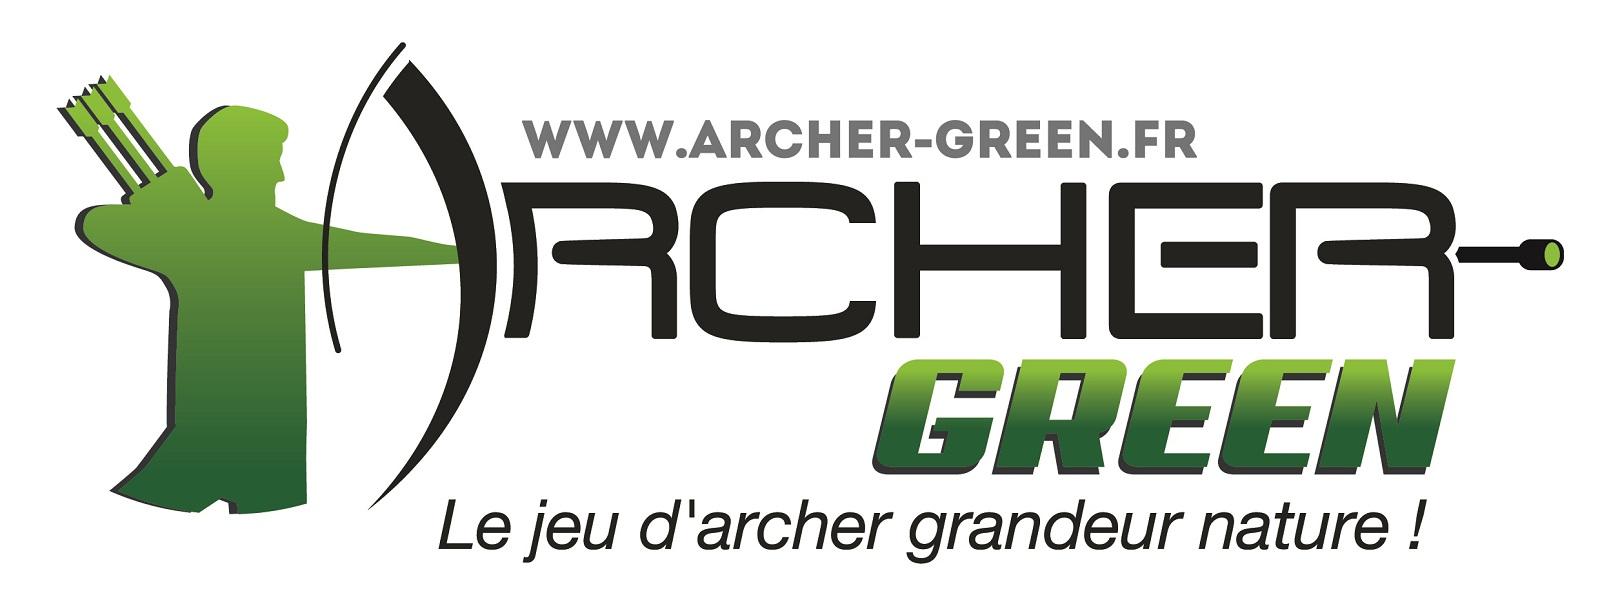 Archer Green 2.jpg